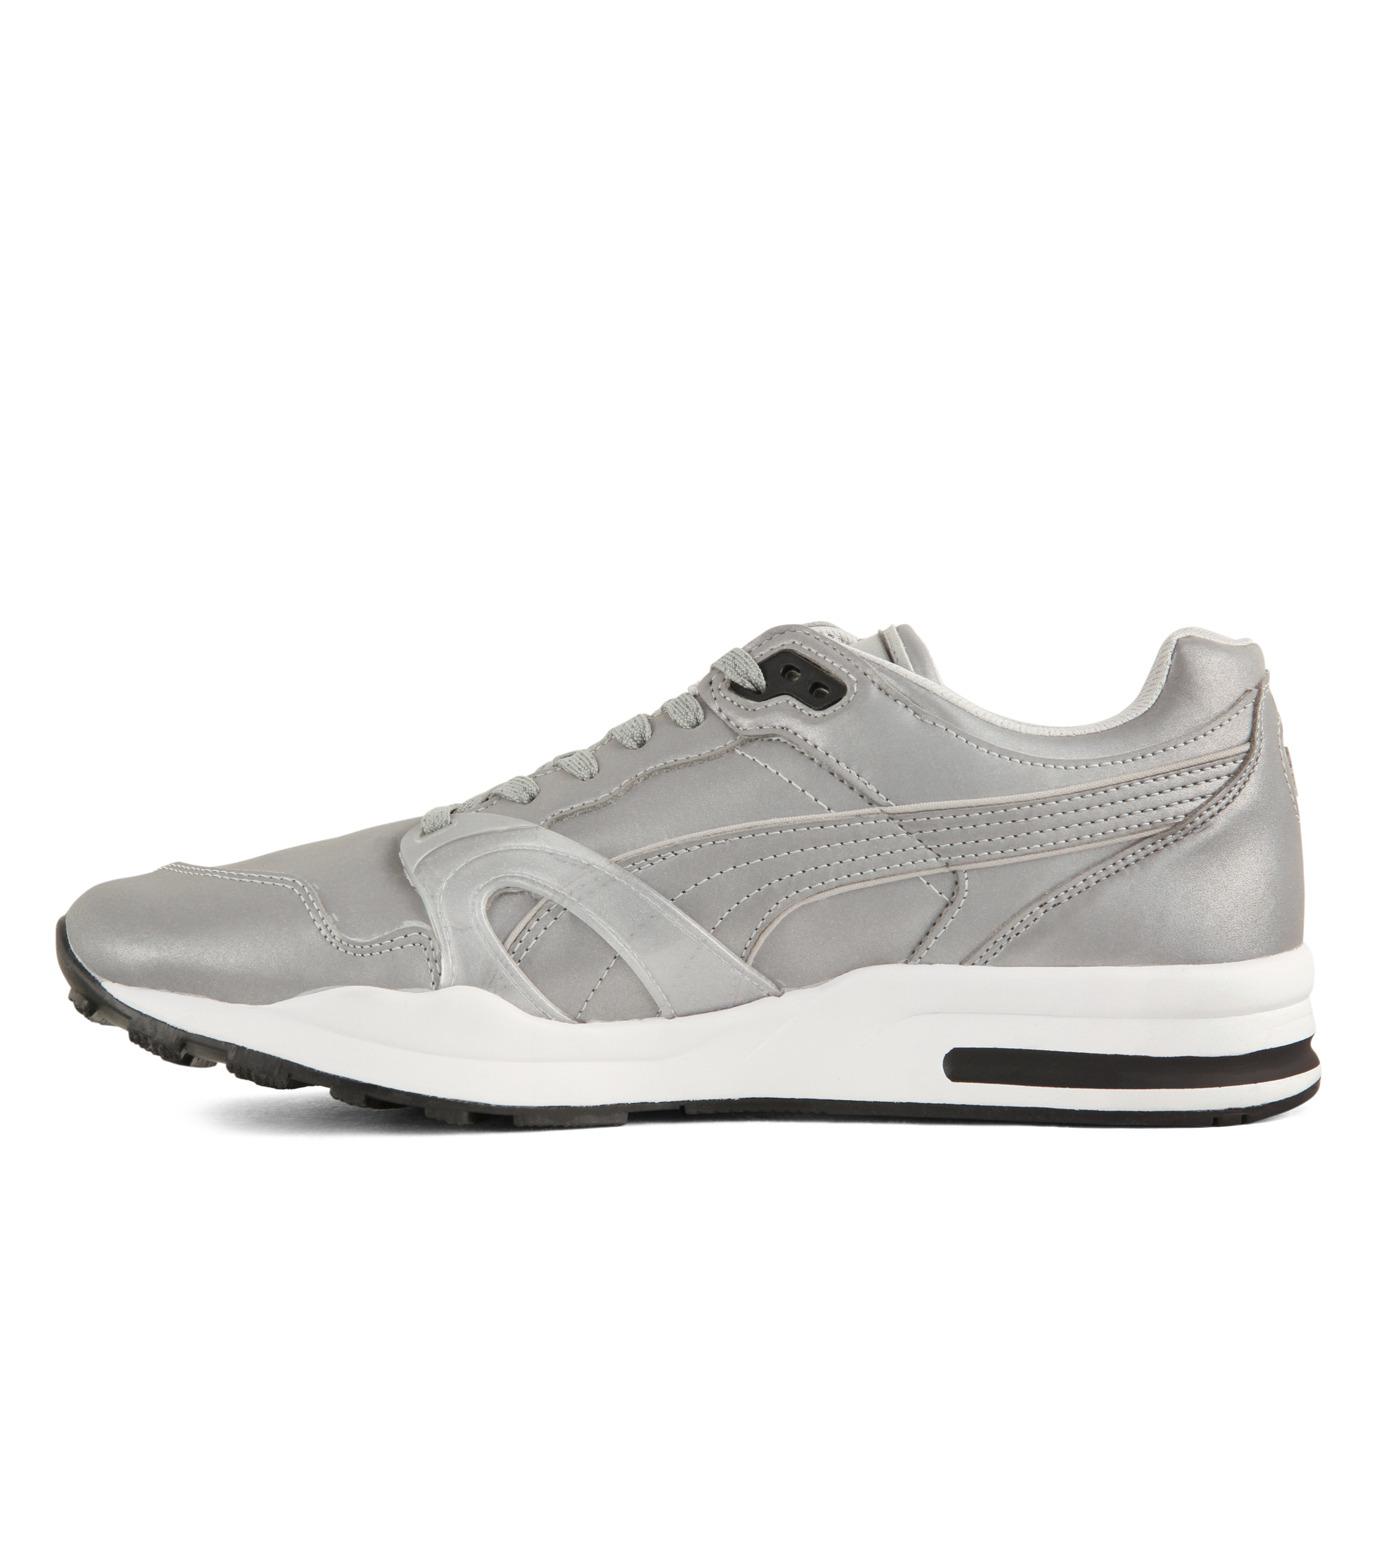 PUMA(プーマ)のXT1 Reflective-WHITE(シューズ/shoes)-358636-4 拡大詳細画像2